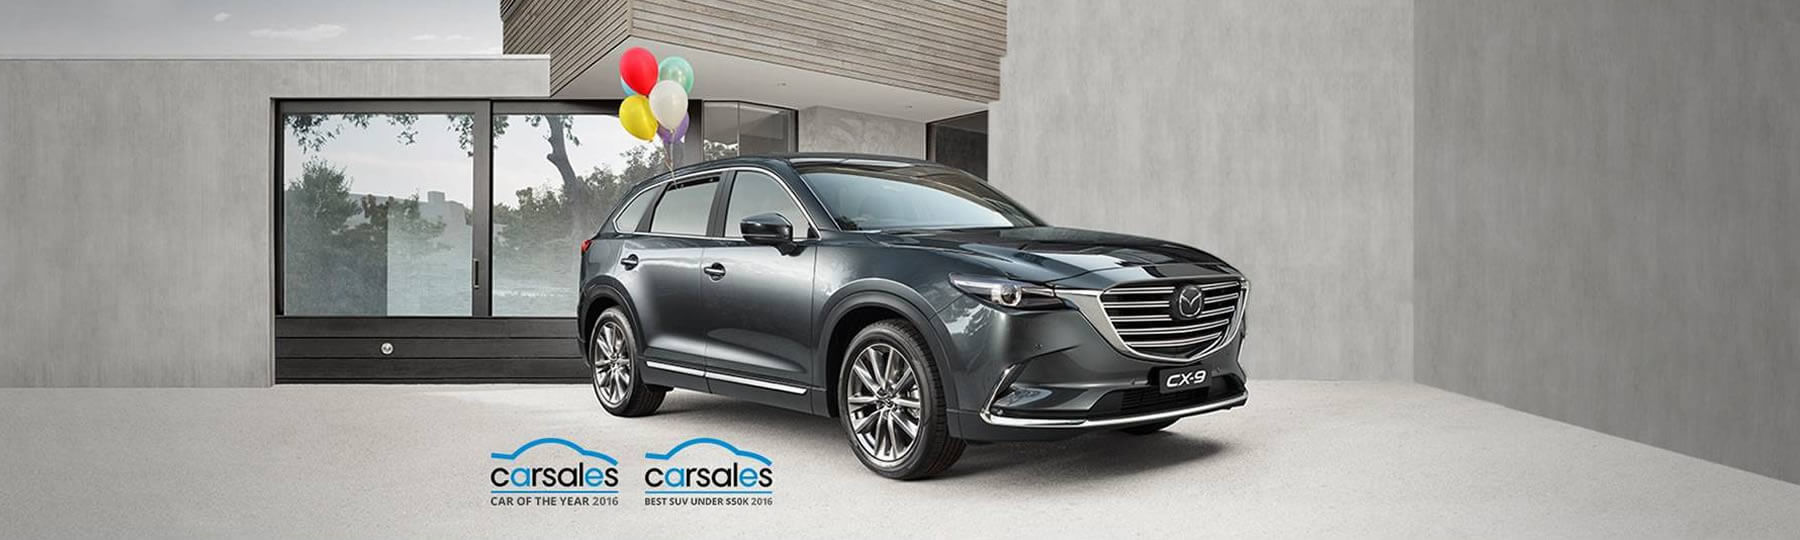 Graeme Powell Mazda Used Cars